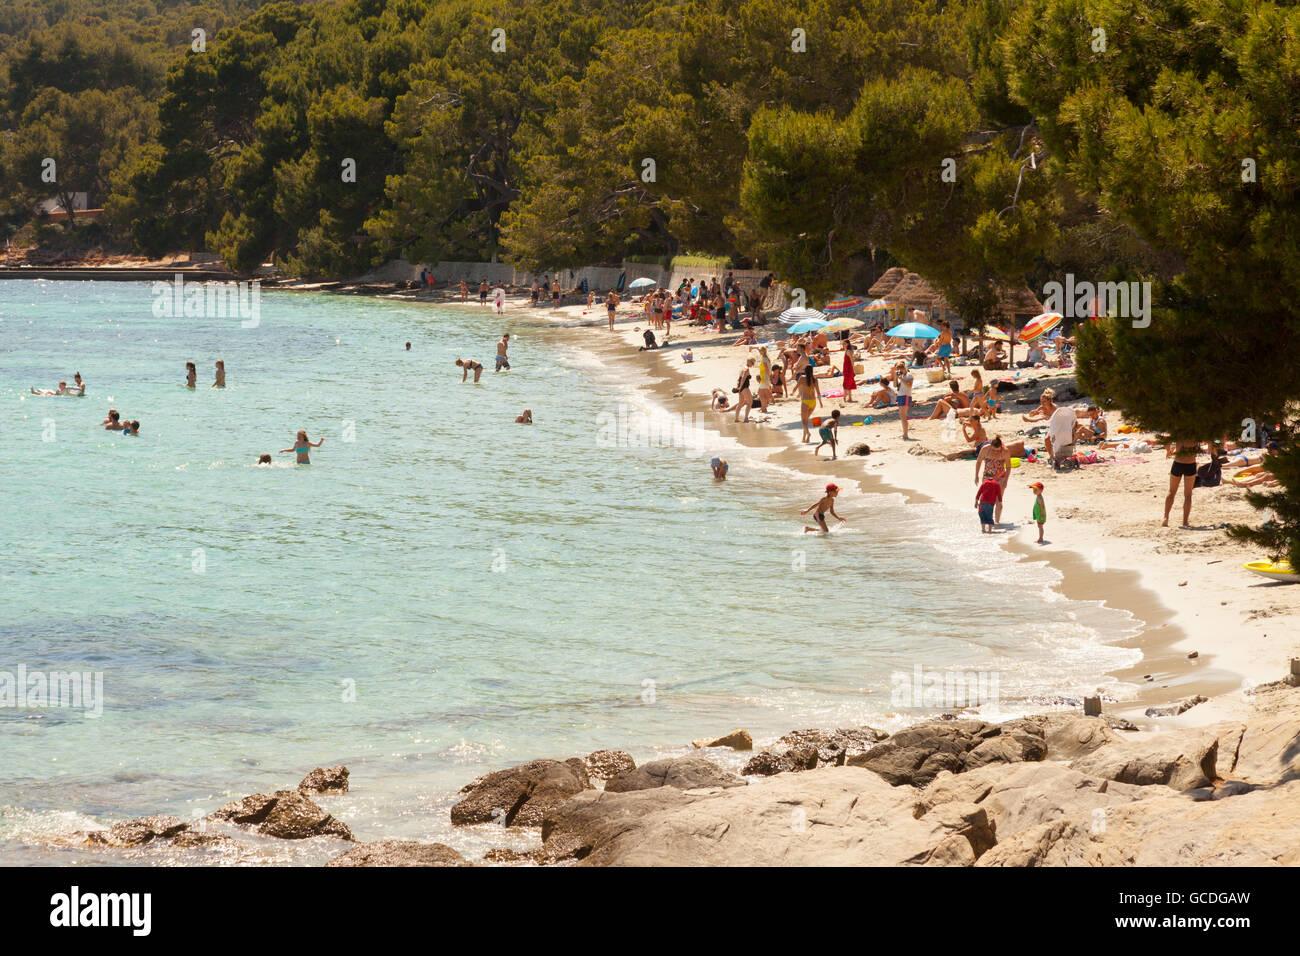 People on the beach at Cala Formentor beach, north coast, Mallorca ( Majorca ), Balearic Islands, Spain Europe - Stock Image